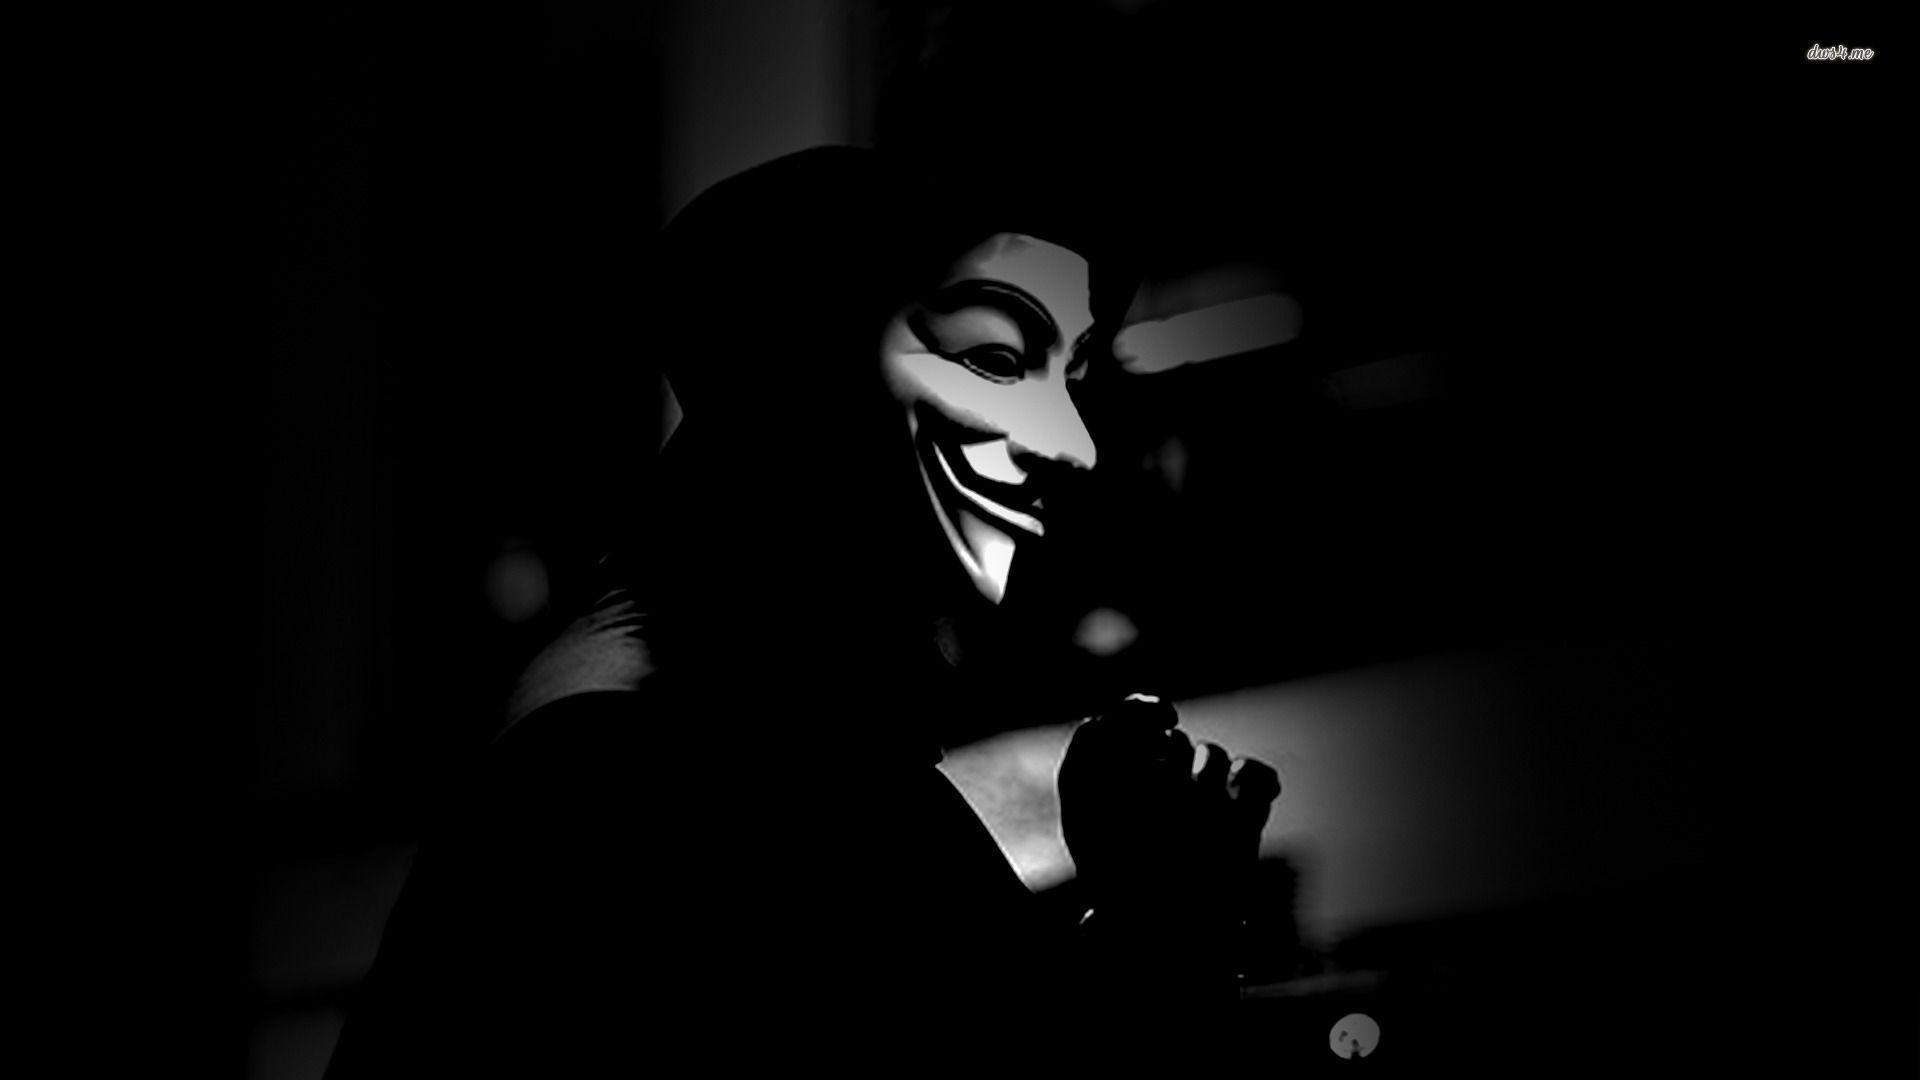 V For Vendetta Wallpapers Wallpaper Cave